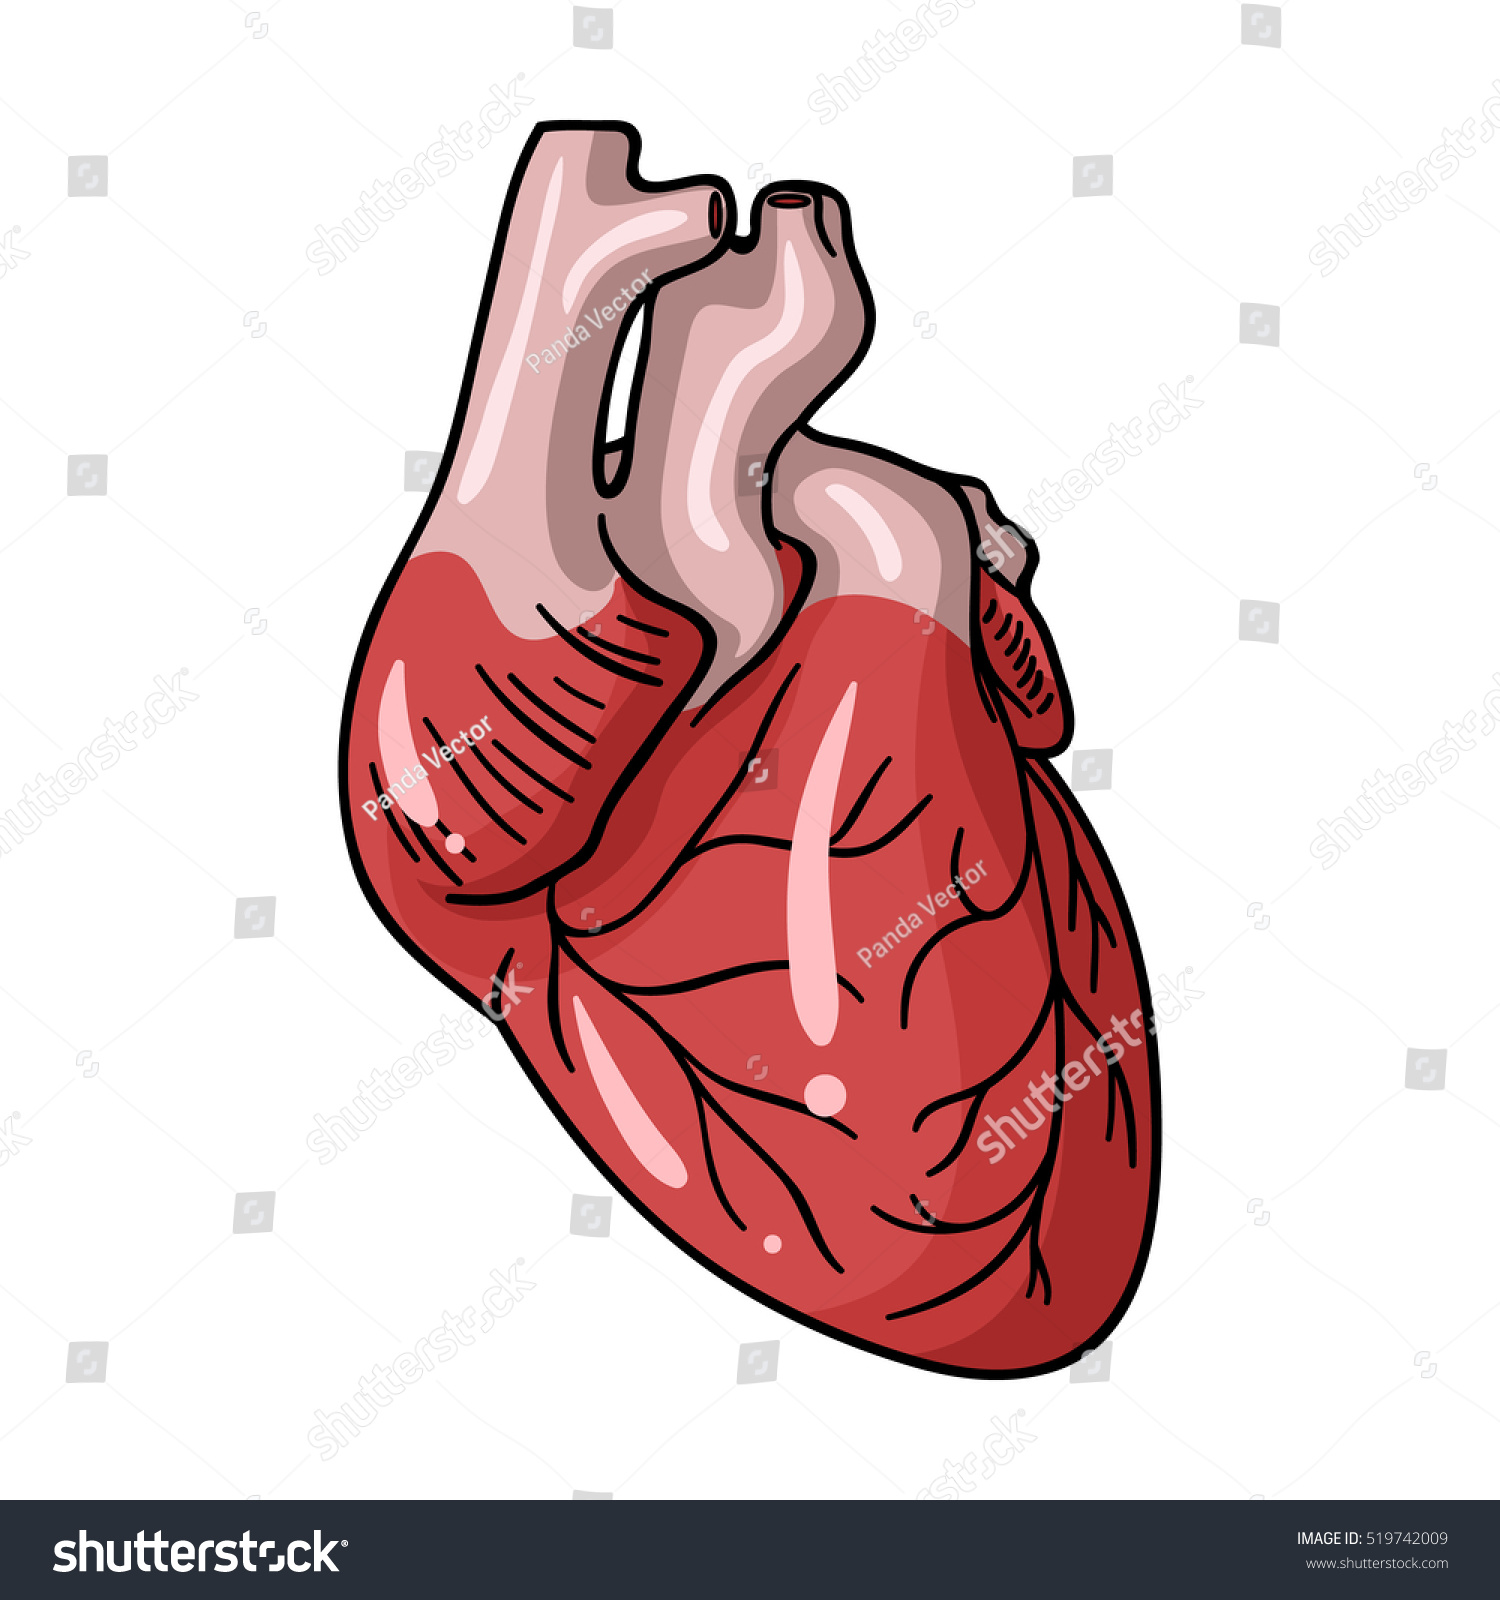 Human heart icon in cartoon style… Stock Photo 519742009